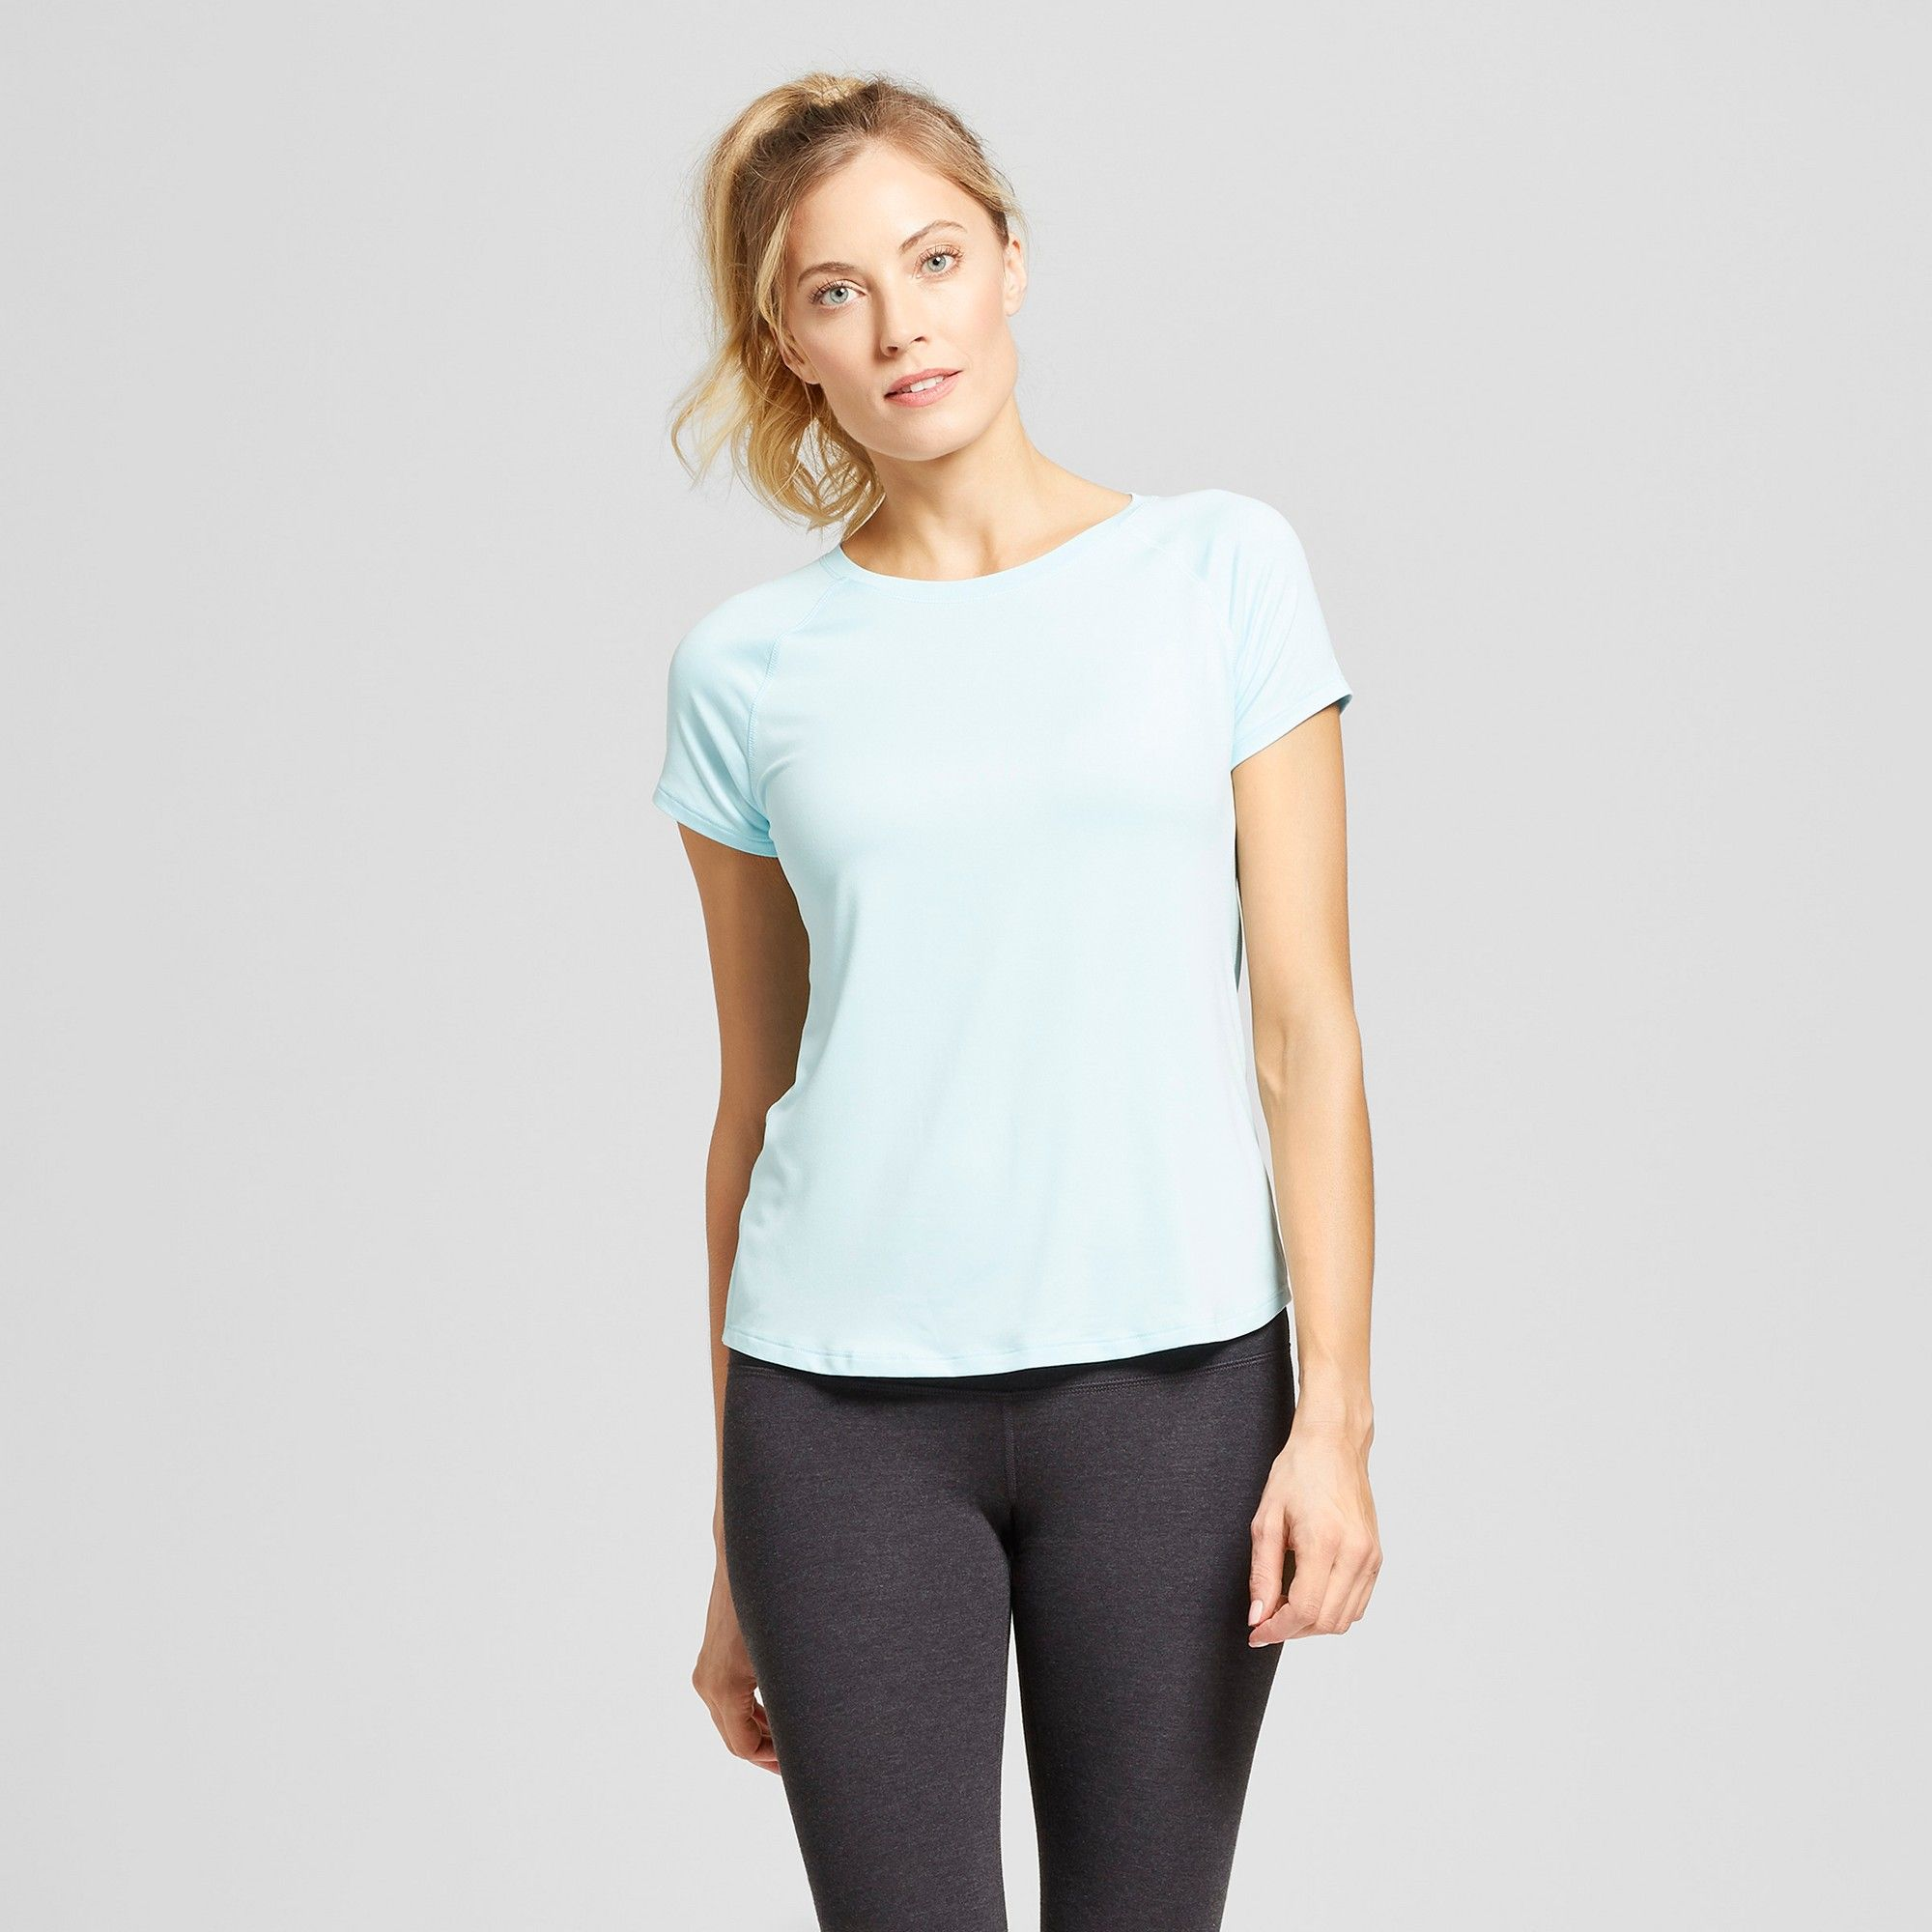 a53e0007ca2b Women's Soft Tech T-Shirt - C9 Champion Light Blue S | Products ...